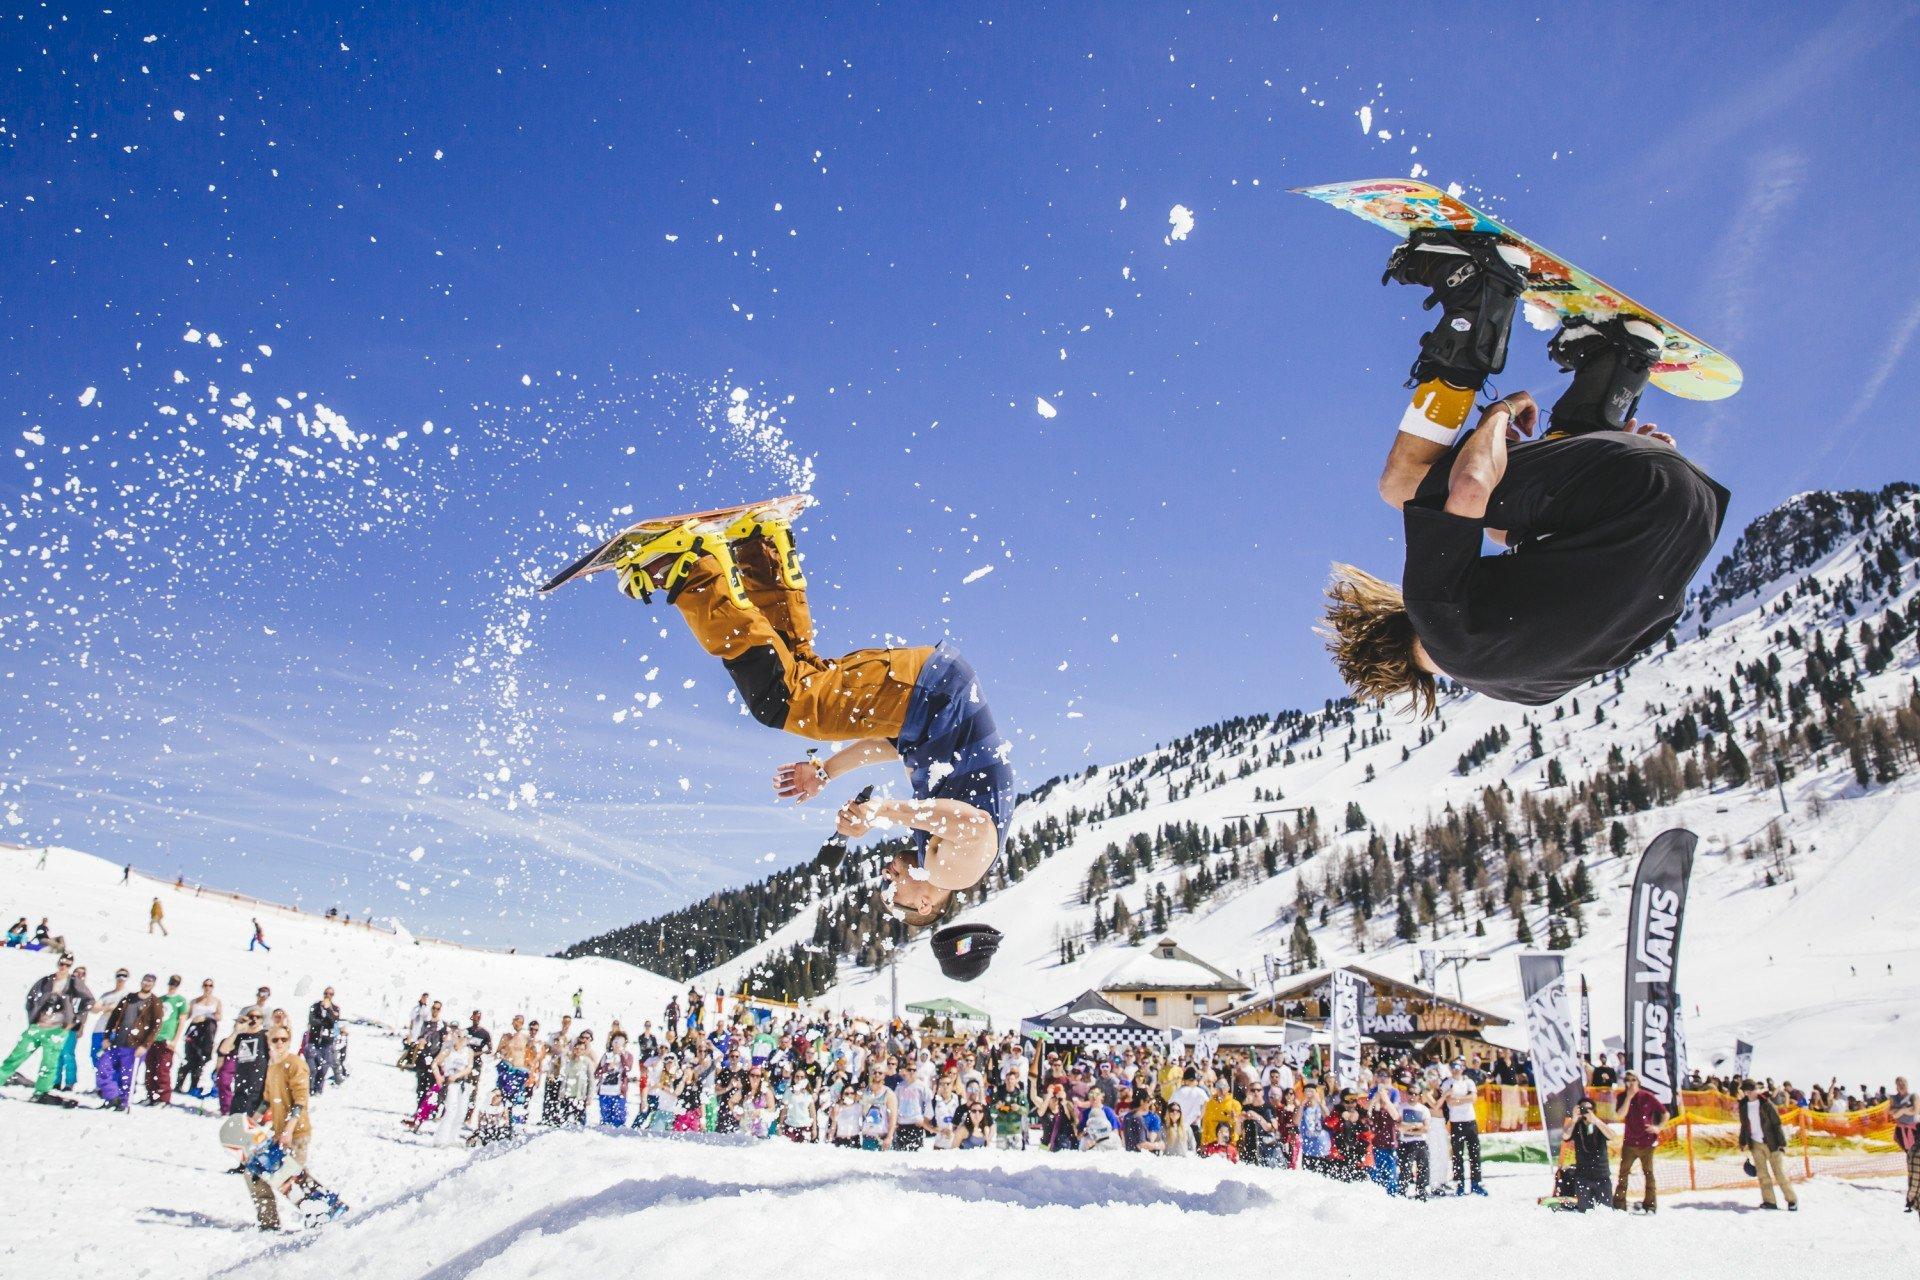 Snowbombing Music Festival in Mayrhofen in Austria - Best Season 2020